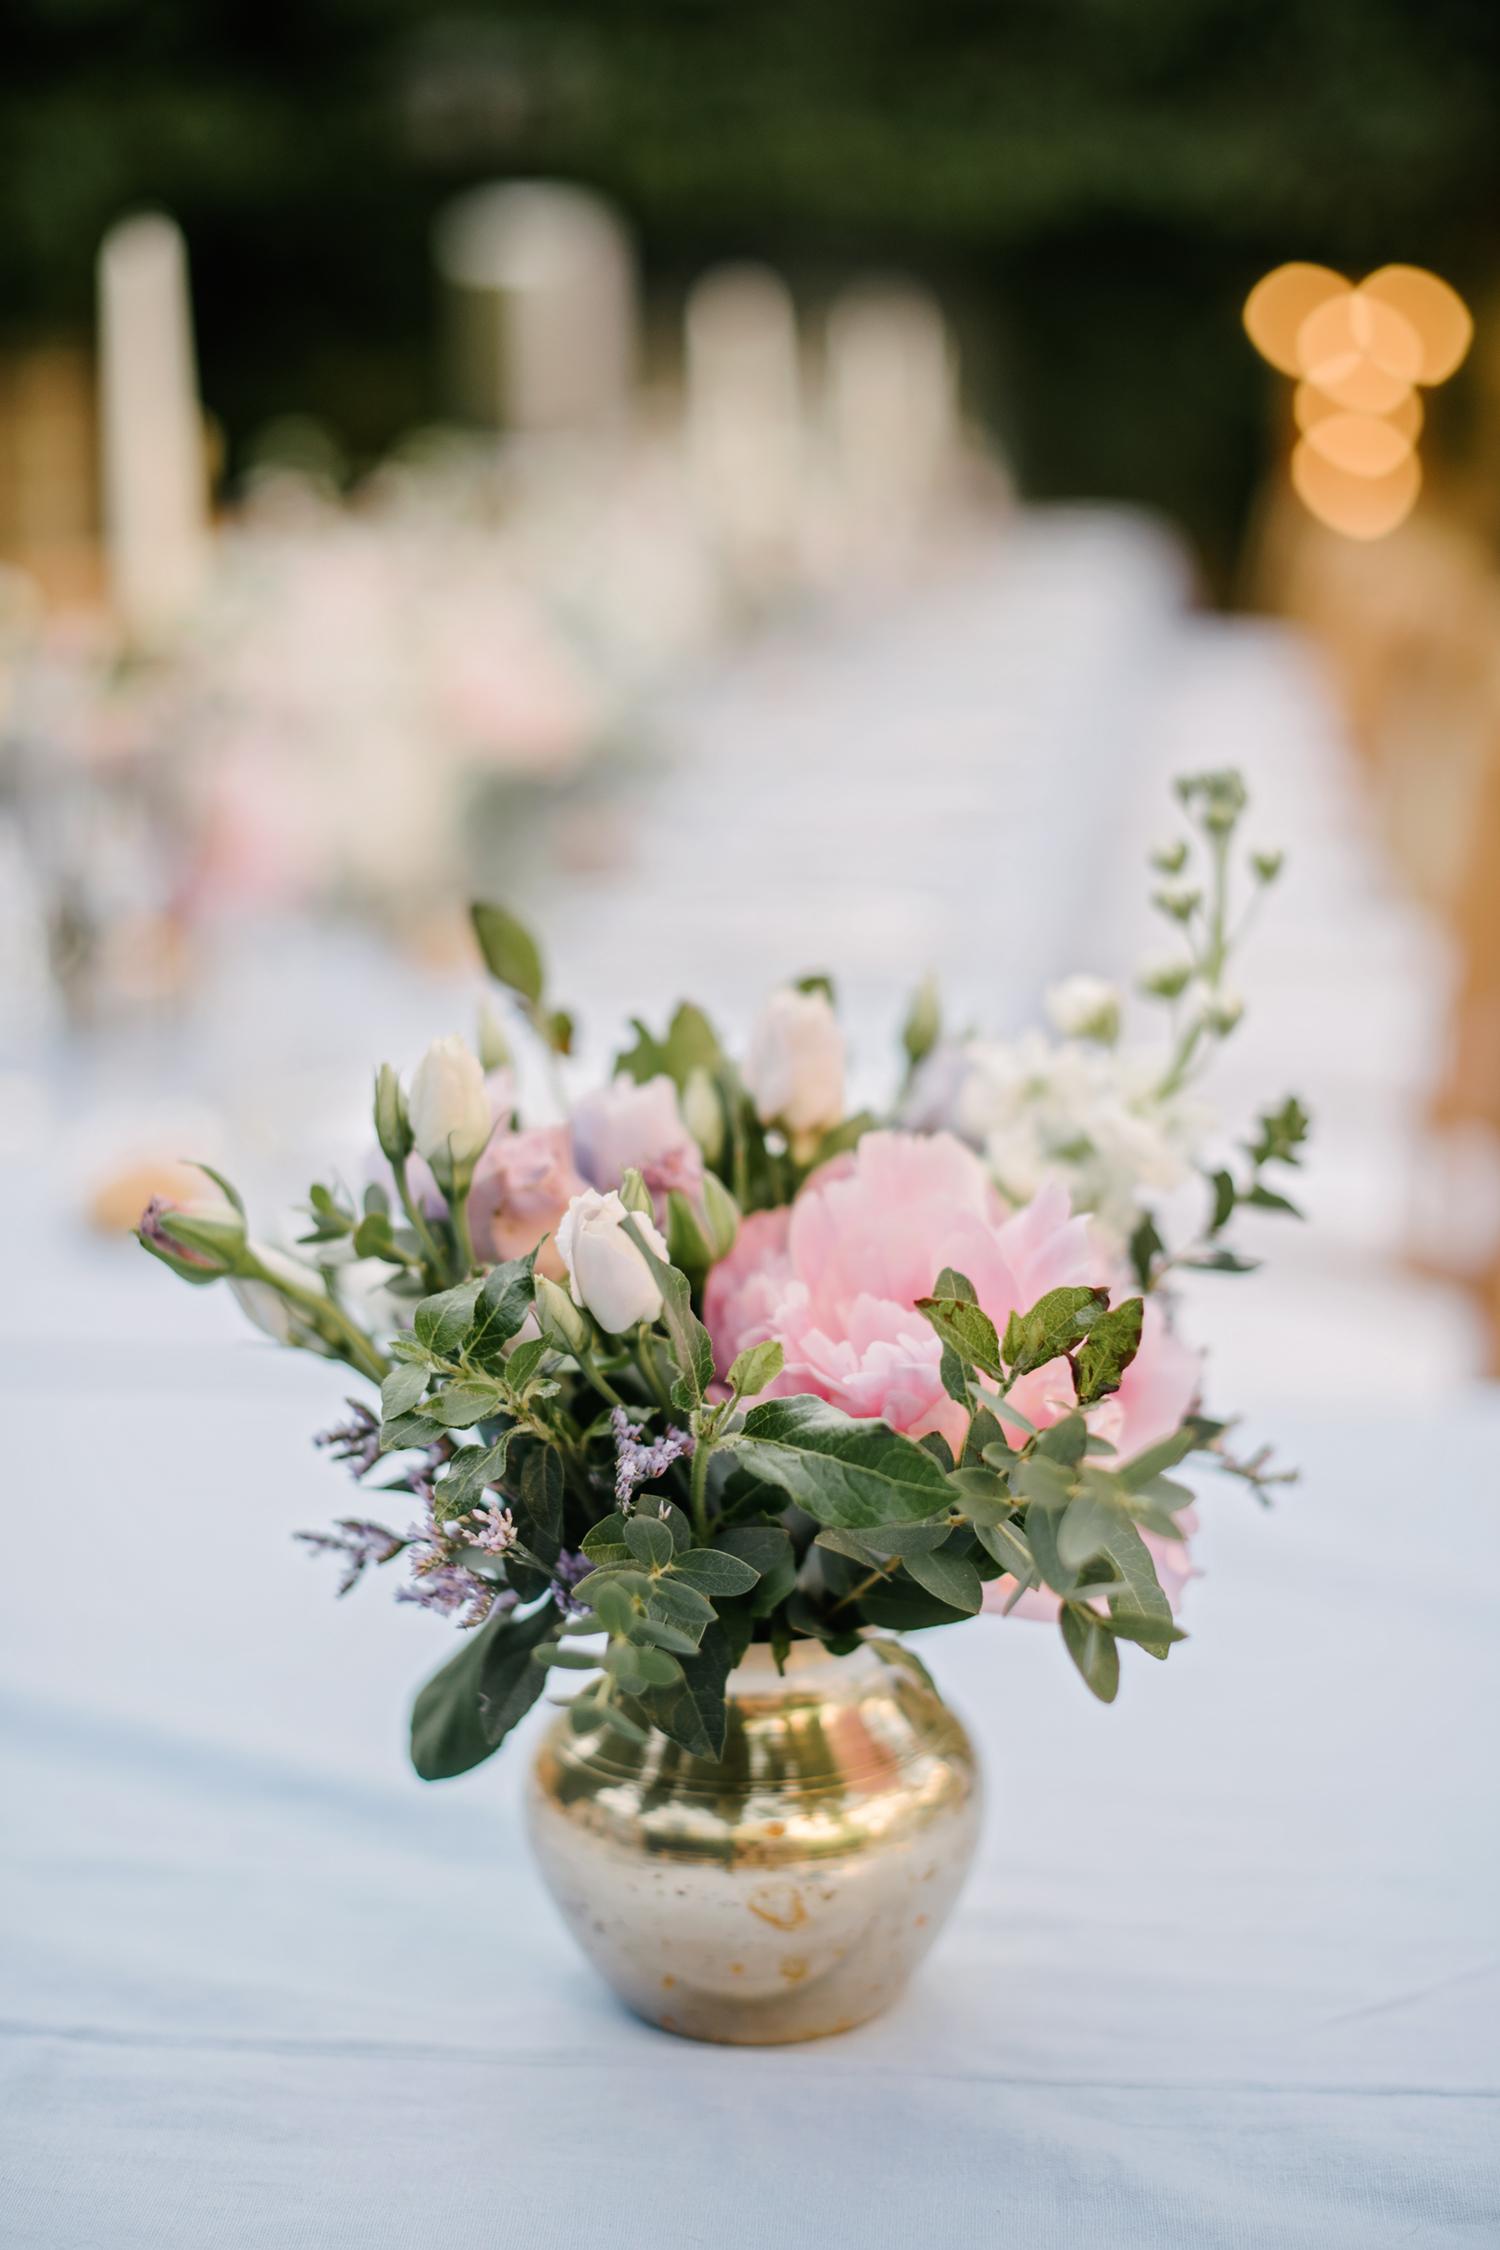 Chateau-Robernier-Wedding-Photographer-0152.jpg